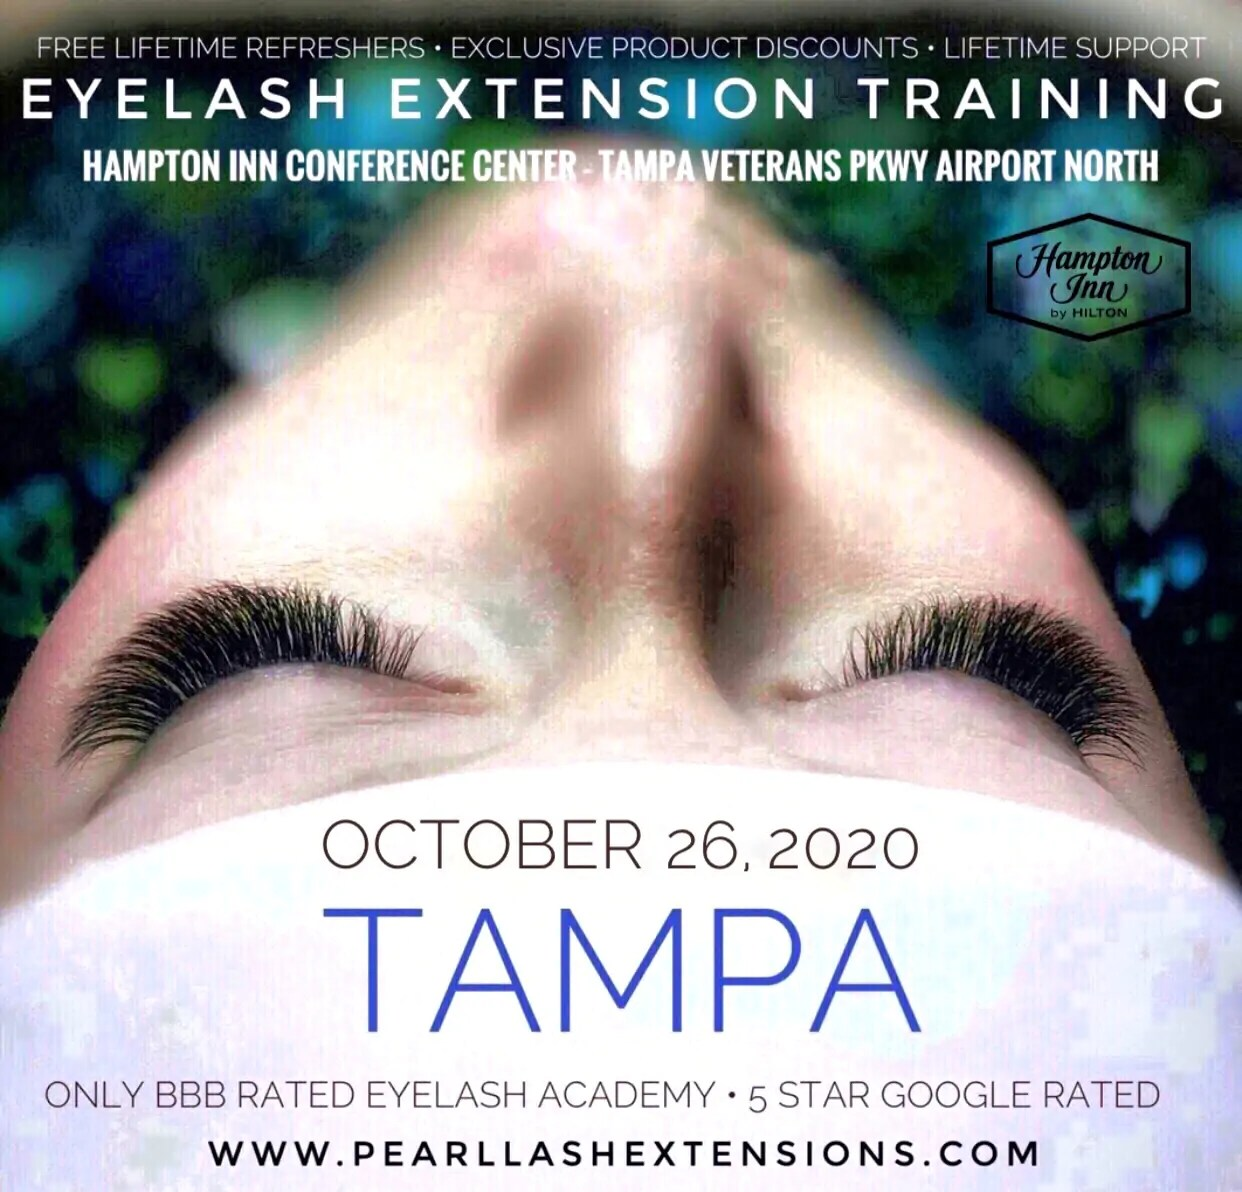 Eyelash Extension Training Tampa by Pearl Lash